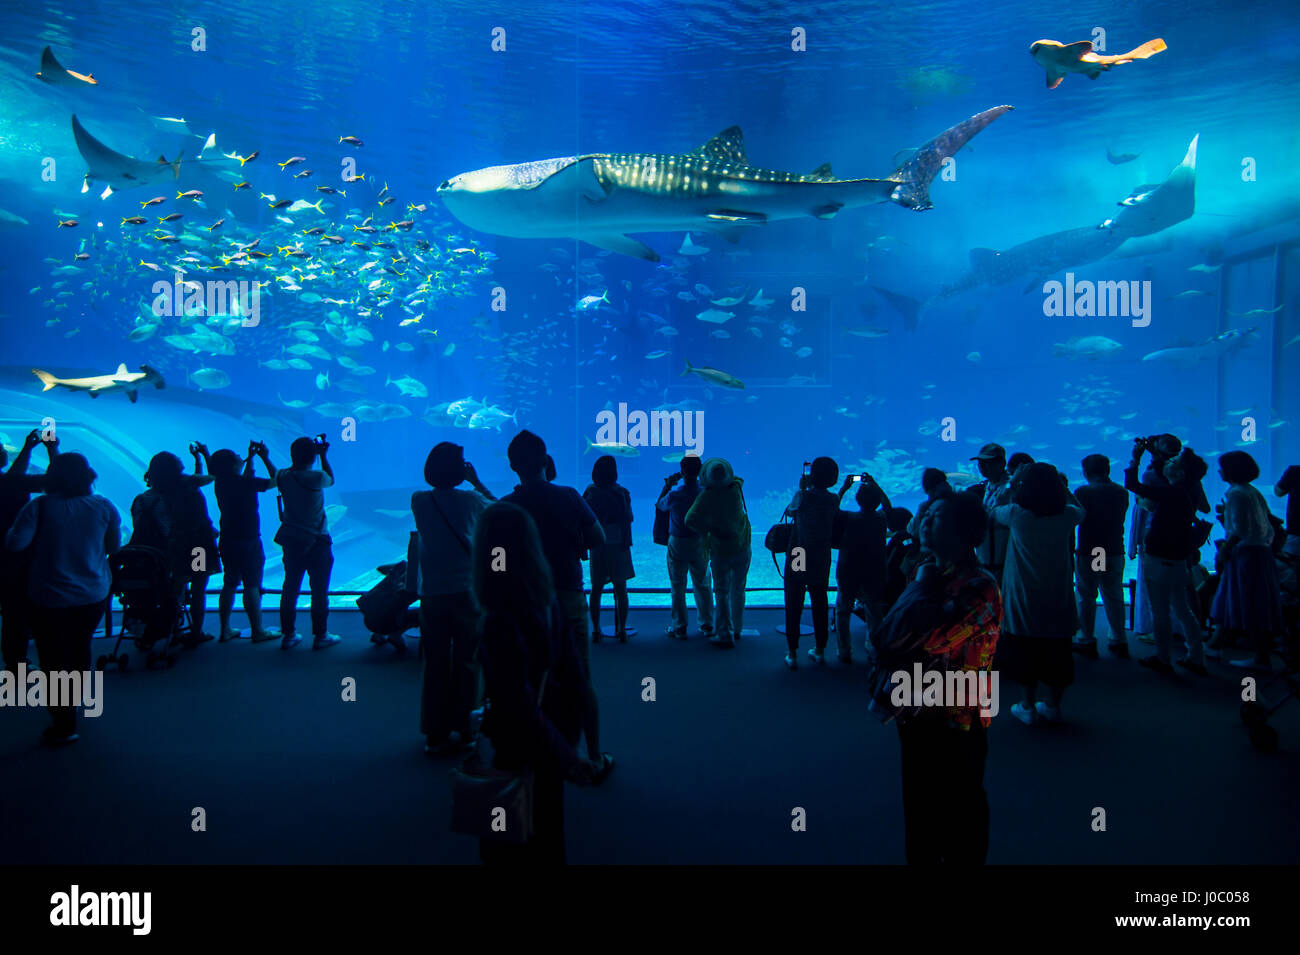 Dans le Whaleshark Churaumi Aquarium, Ocean Expo Park, Okinawa, Japon, Asie Photo Stock